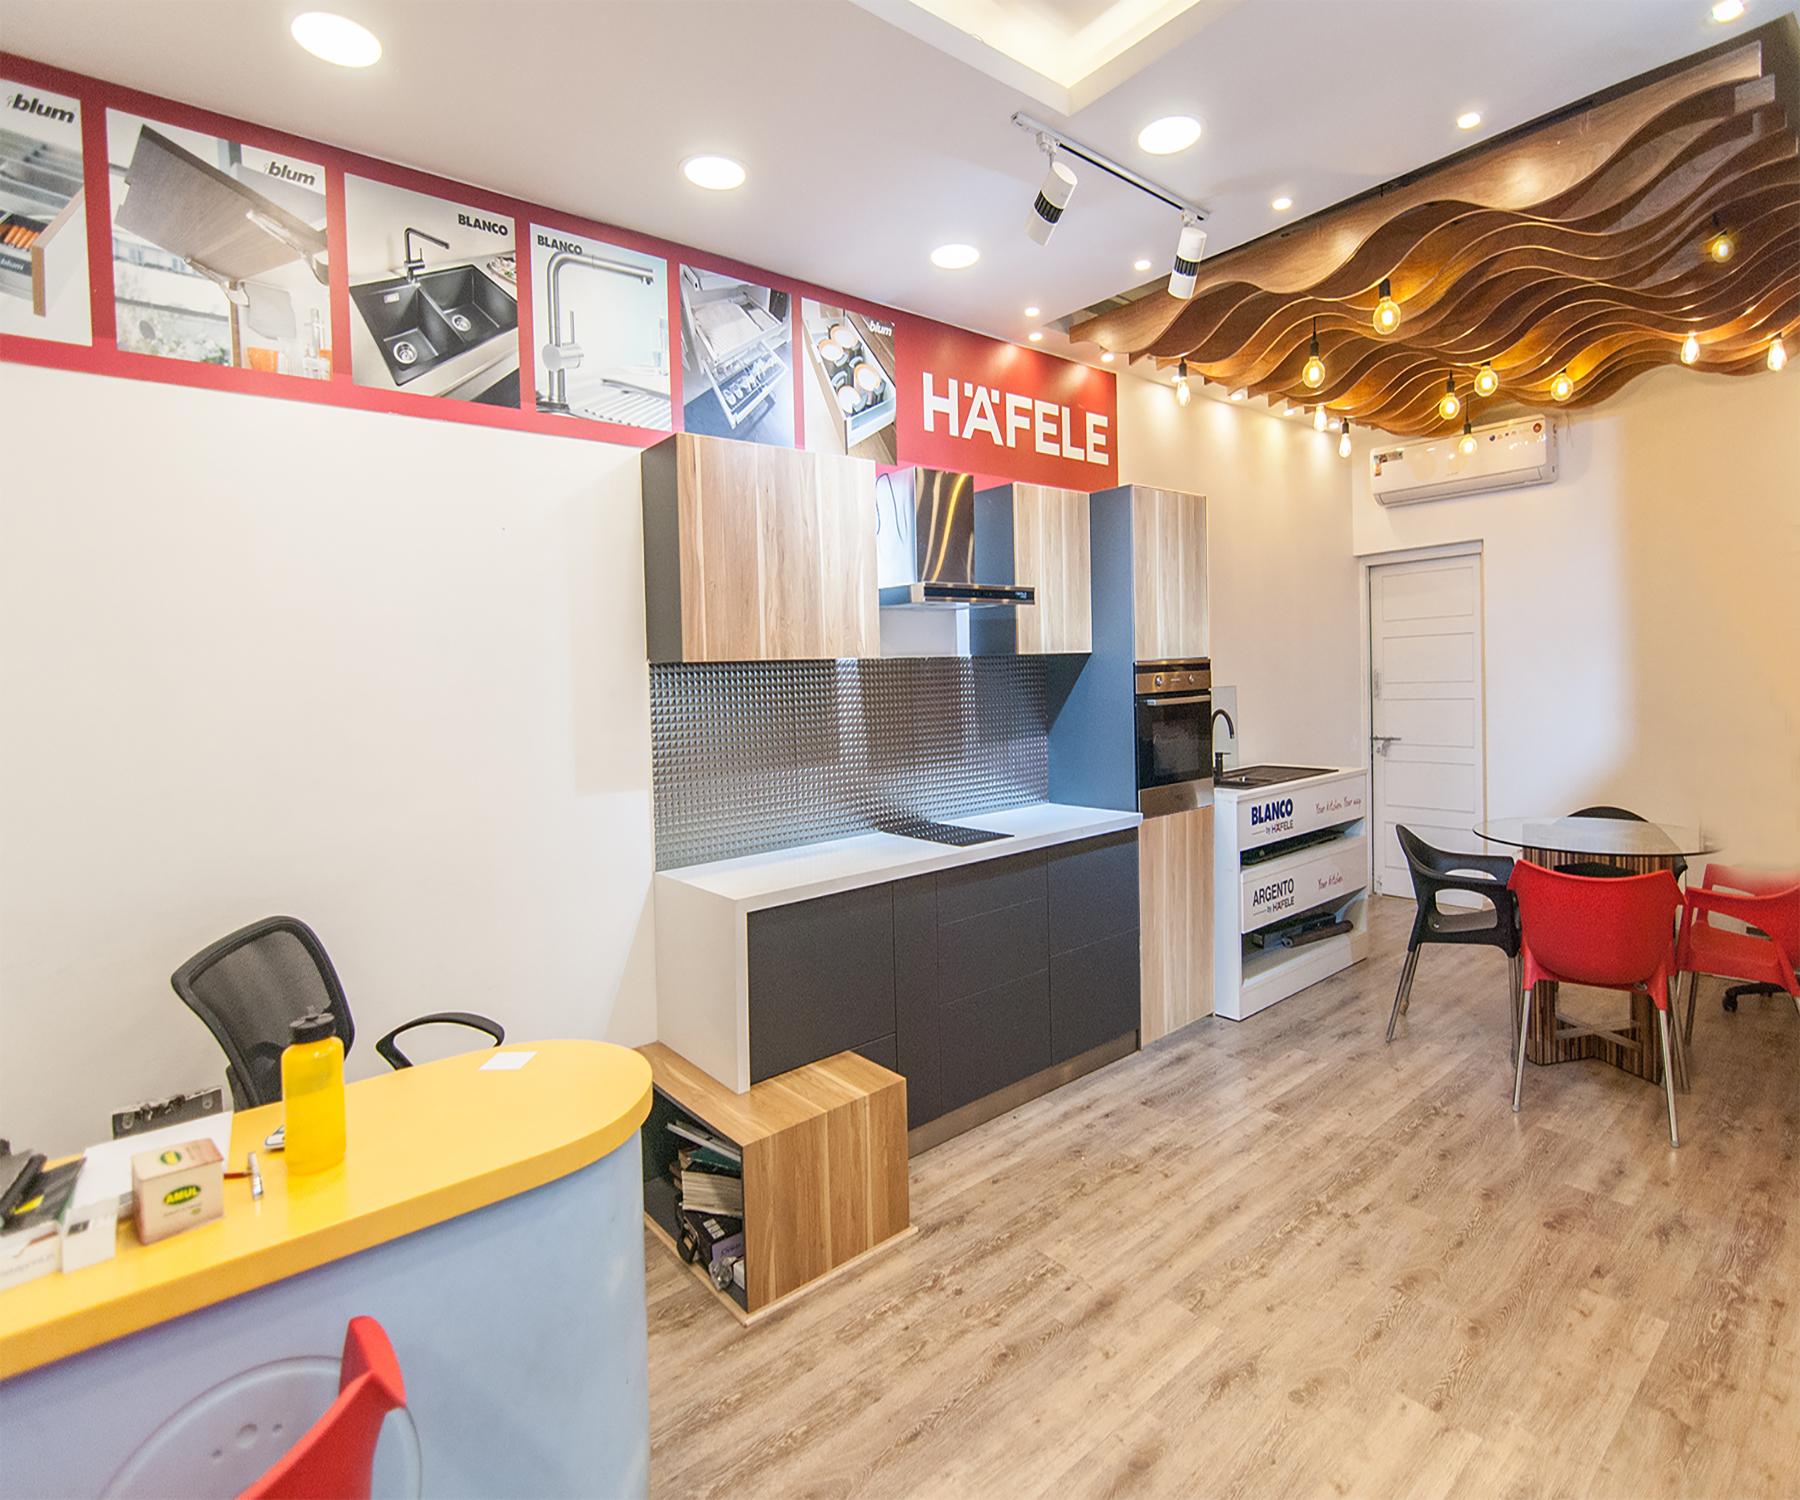 Hafele exclusive showroom design studio hsr layout for Design appartement hafele